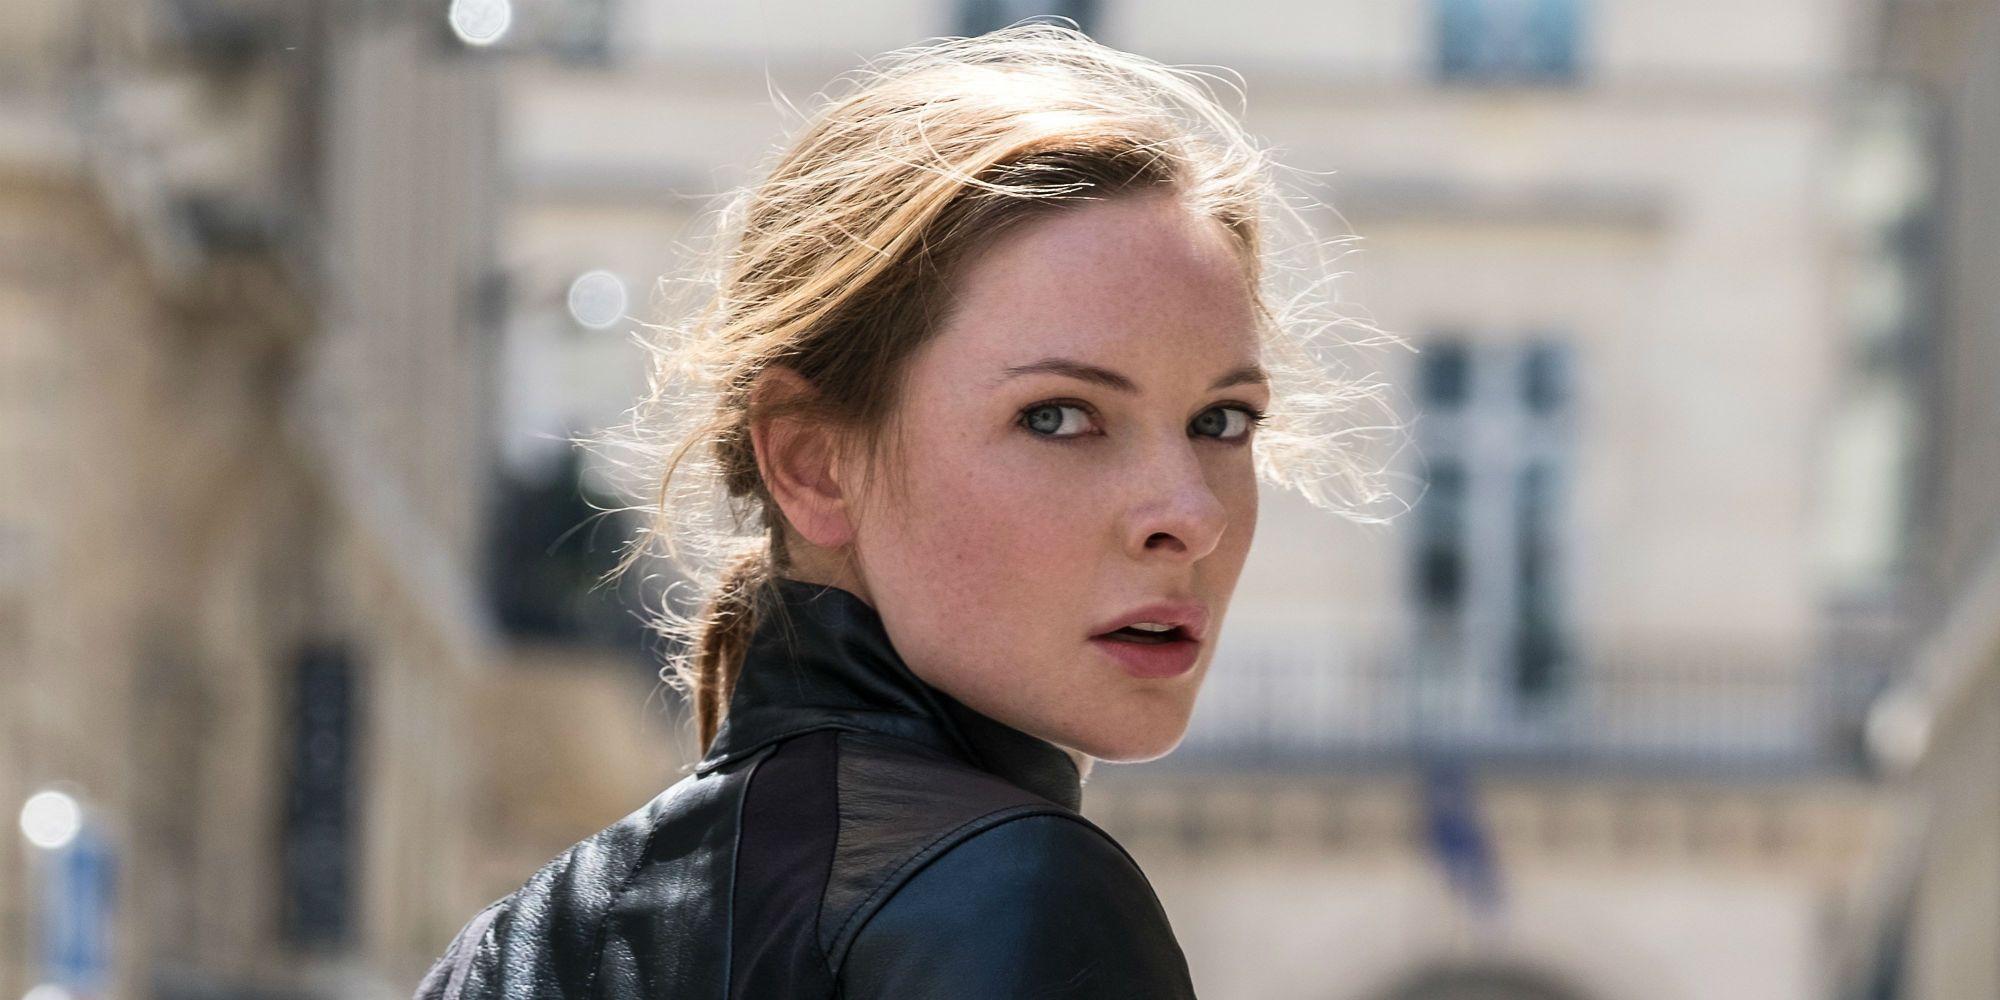 Mission Impossible 7: Rebecca Ferguson To Return | Screen Rant